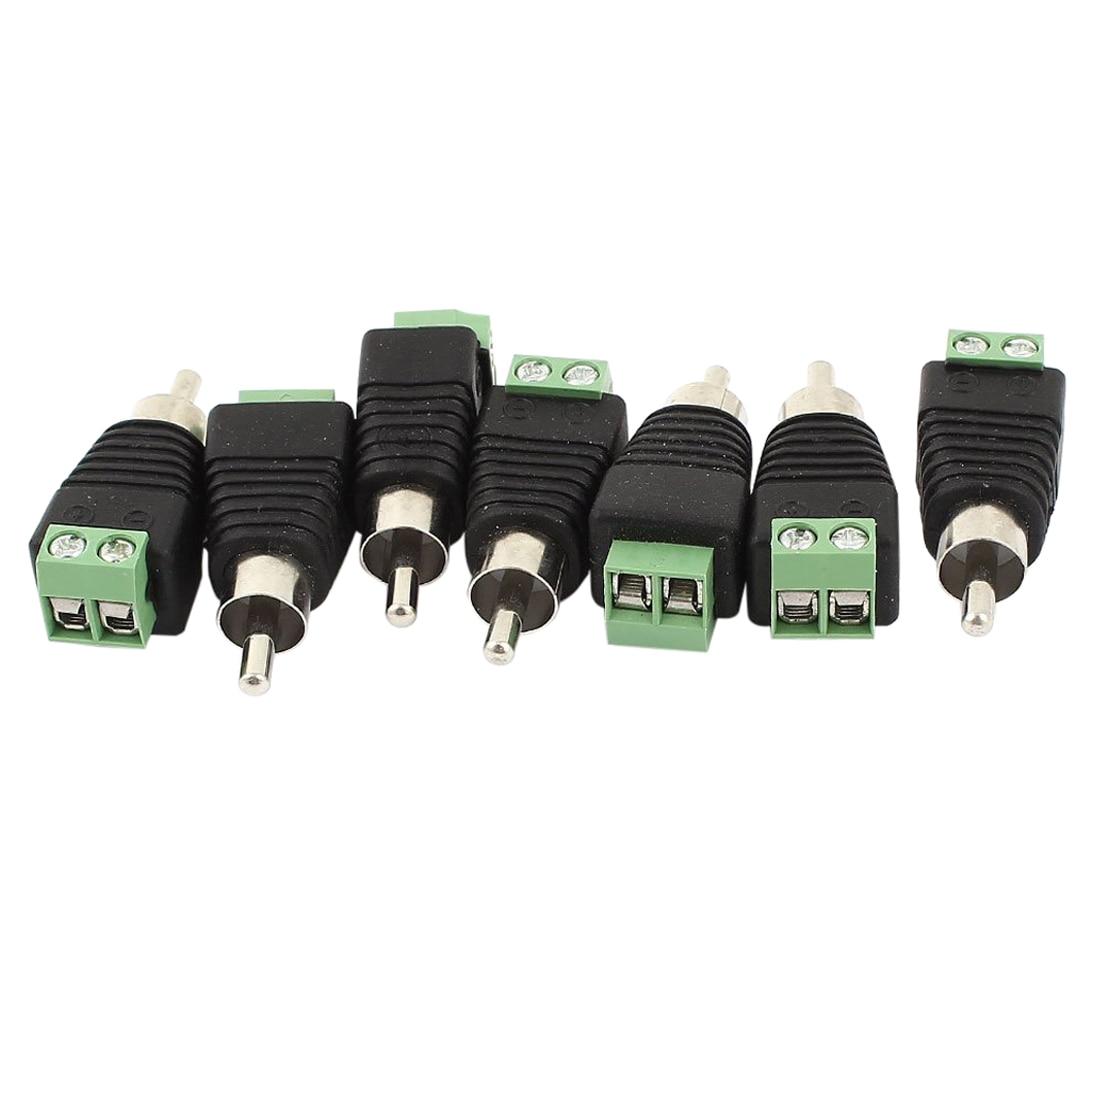 7 x CCTV UTP audio AV RCA male, video balun terminal screw, green, black 3pcs lot cctv phono rca male plug to av terminal connector video av balun international standard